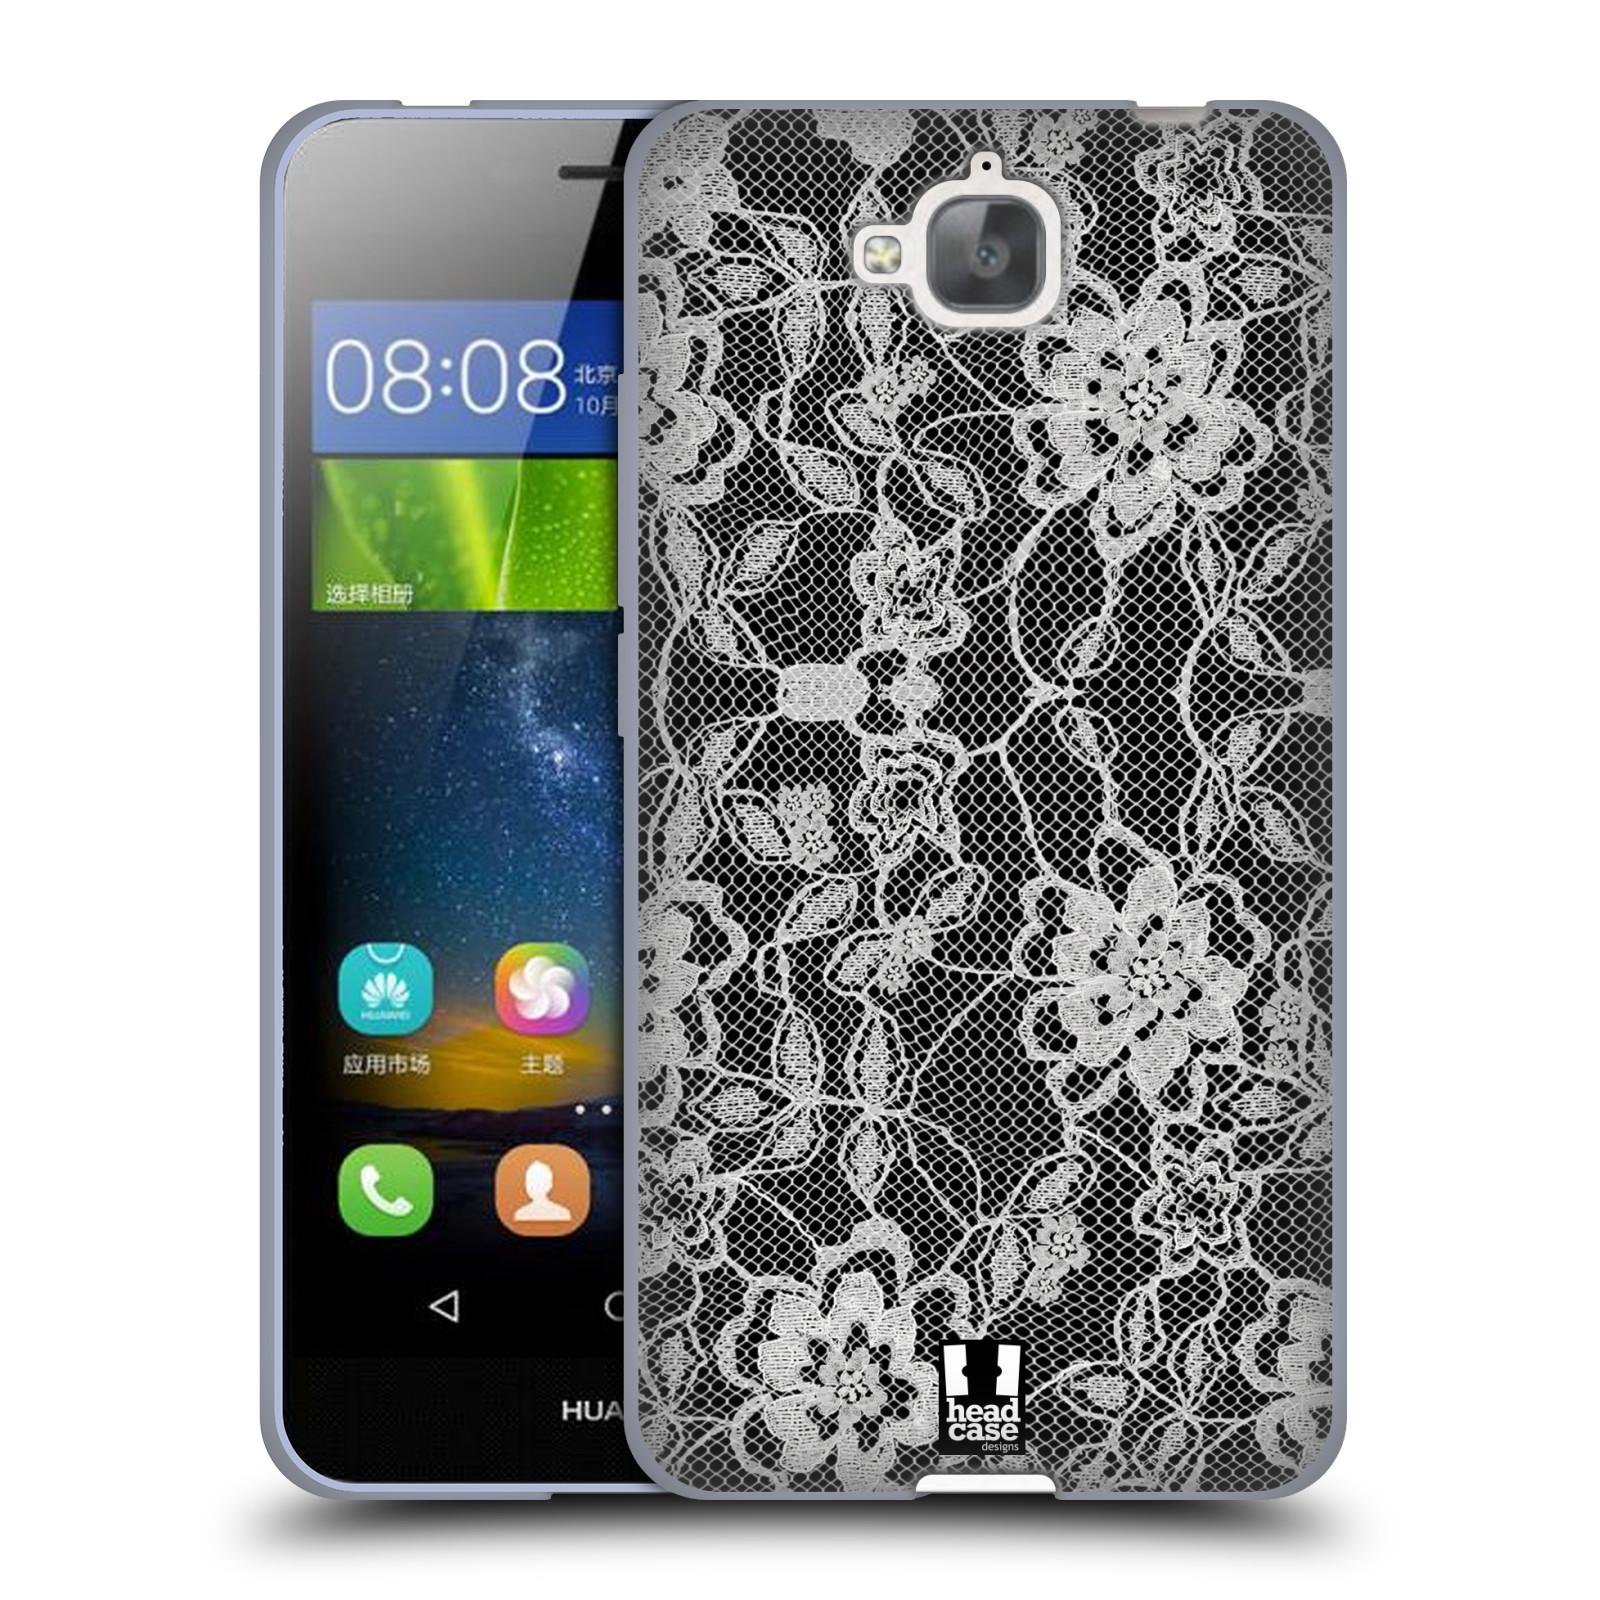 Silikonové pouzdro na mobil Huawei Y6 Pro Dual Sim HEAD CASE FLOWERY KRAJKA